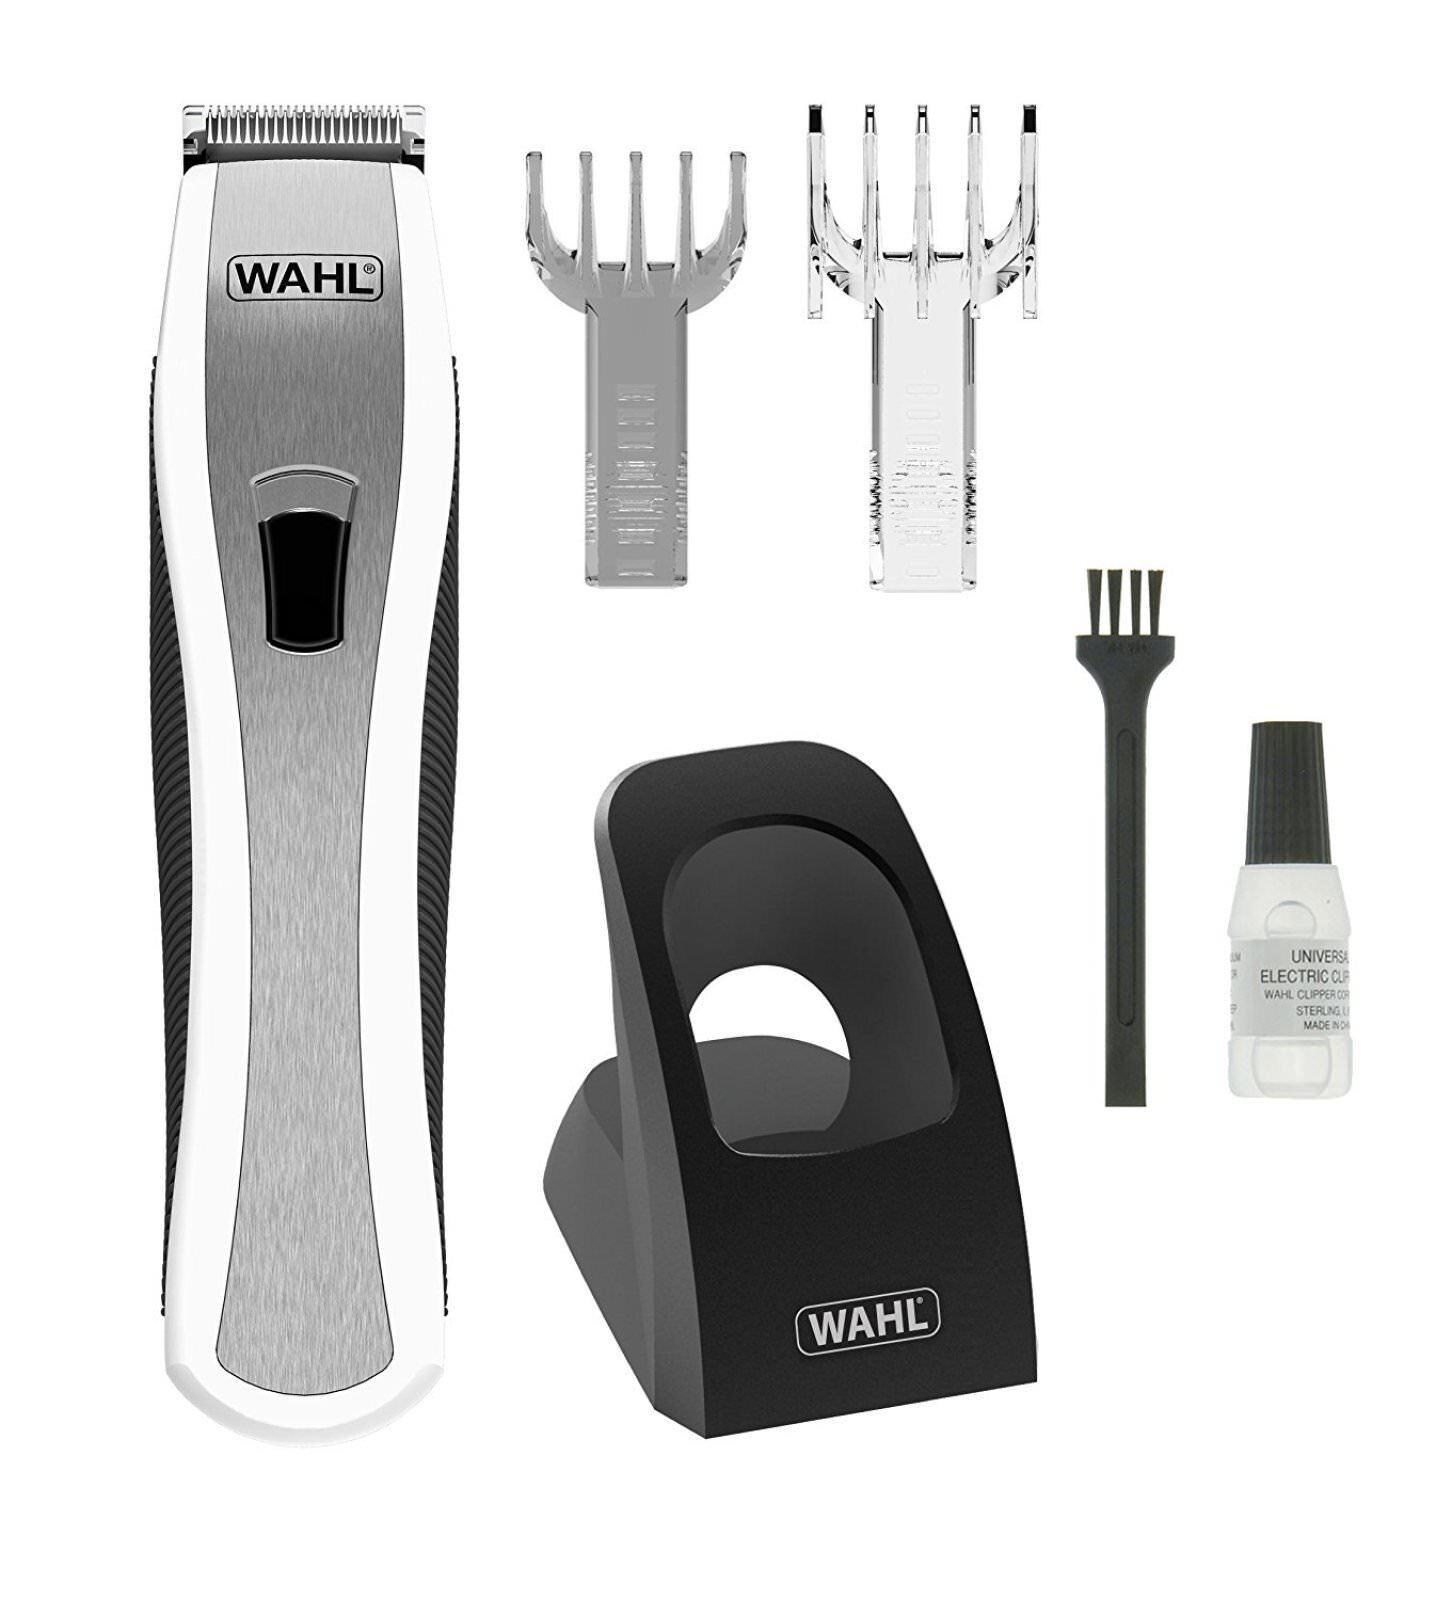 Wahl Lithium Pro Hair Clipper Machine Beard Trimmer Barber